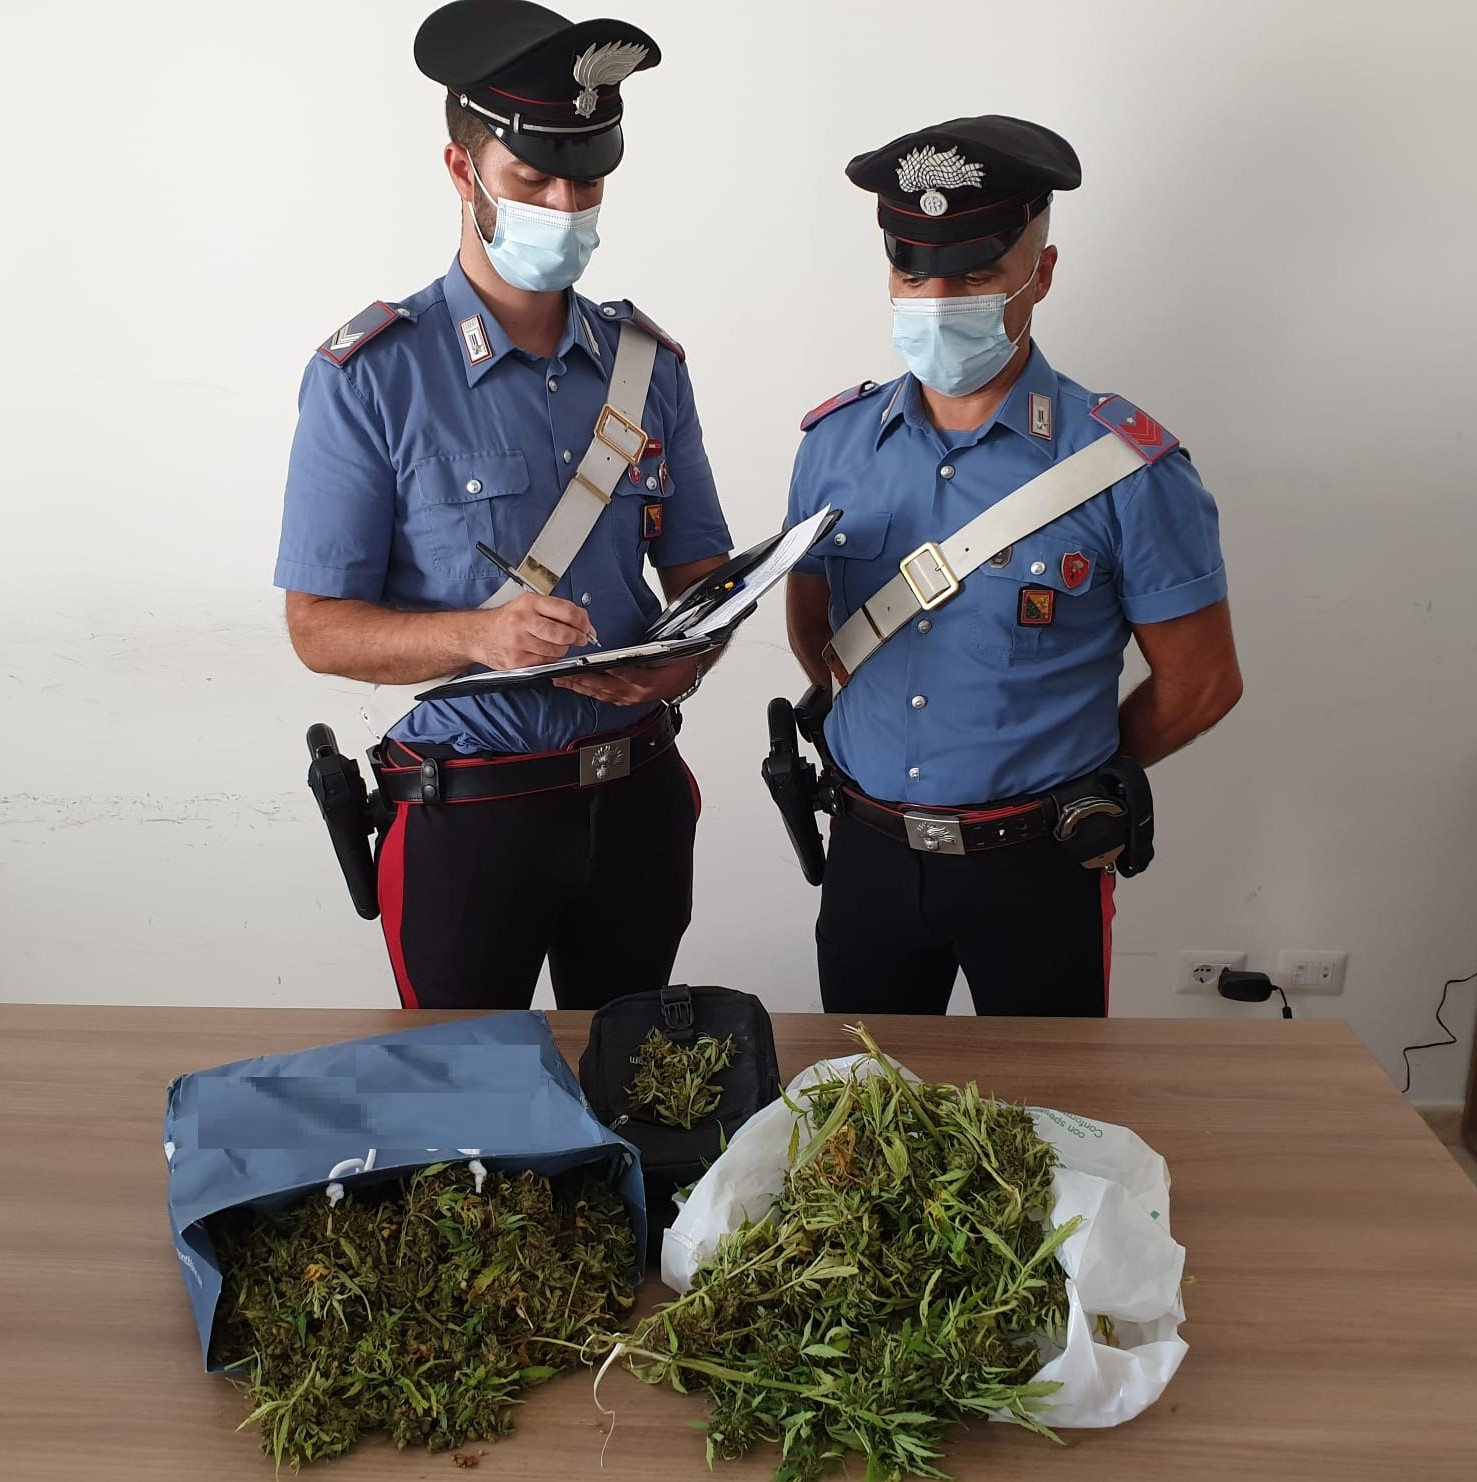 Carlentini, aveva quasi due chili di marijuana: arrestato un minorenne